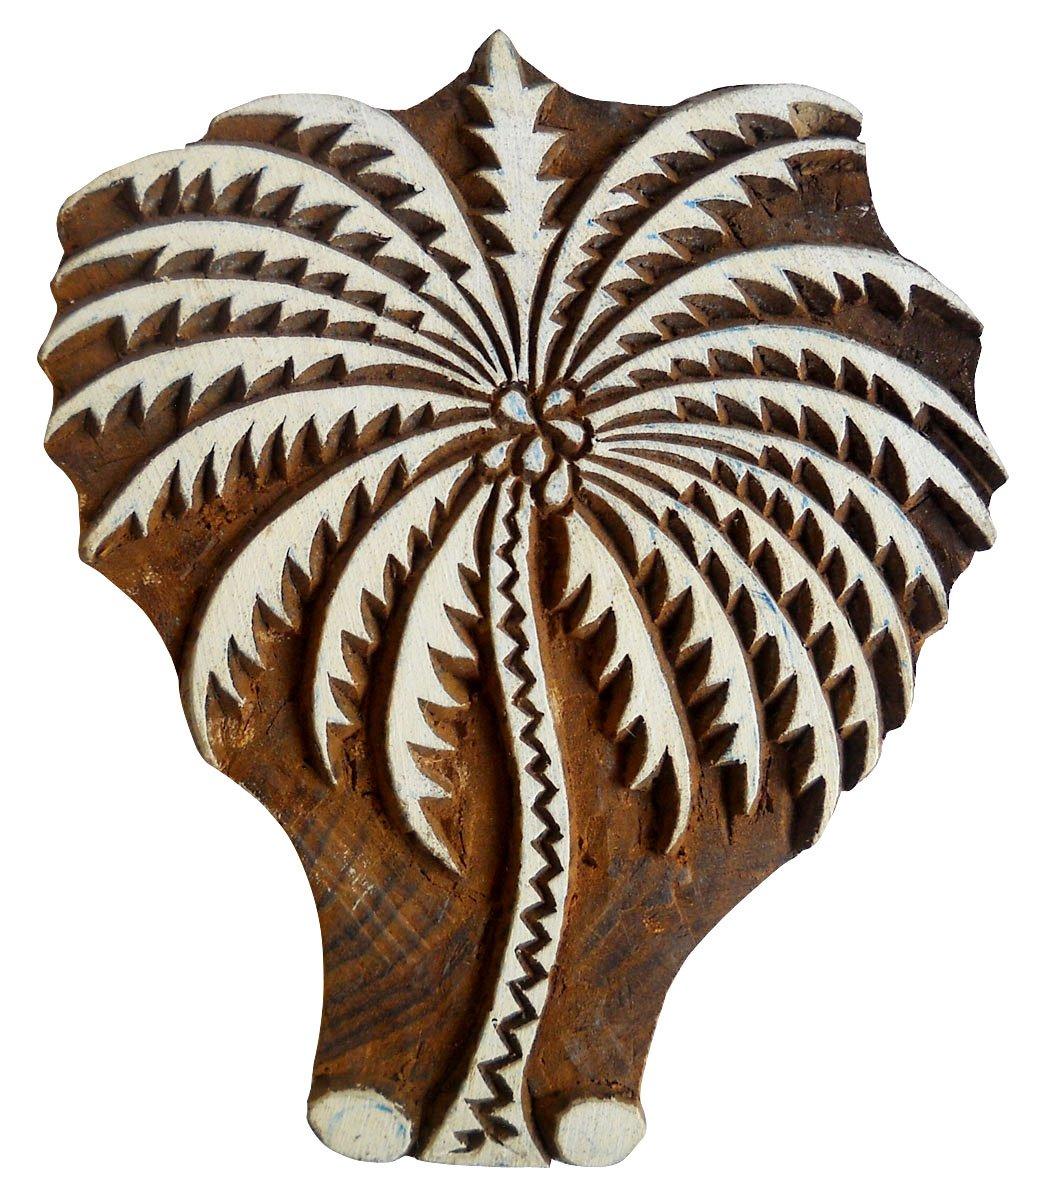 Coconut Tree Design Wooden Printing Block/Stamp Textile Fabric Printing